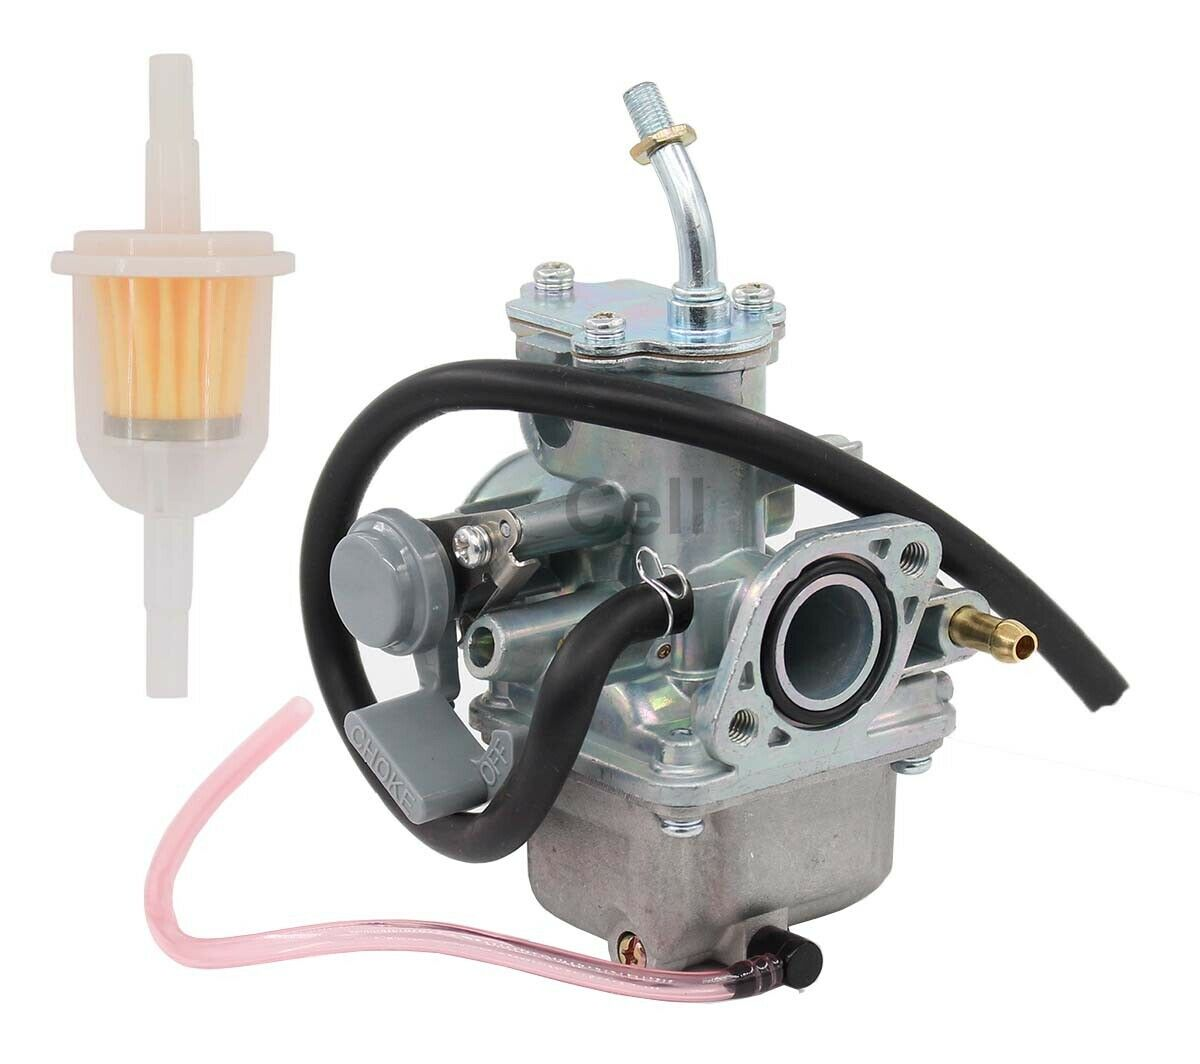 hight resolution of new carburetor for yamaha moto 4 yfm 80 moto 4 yfm80 carb w fuel filter